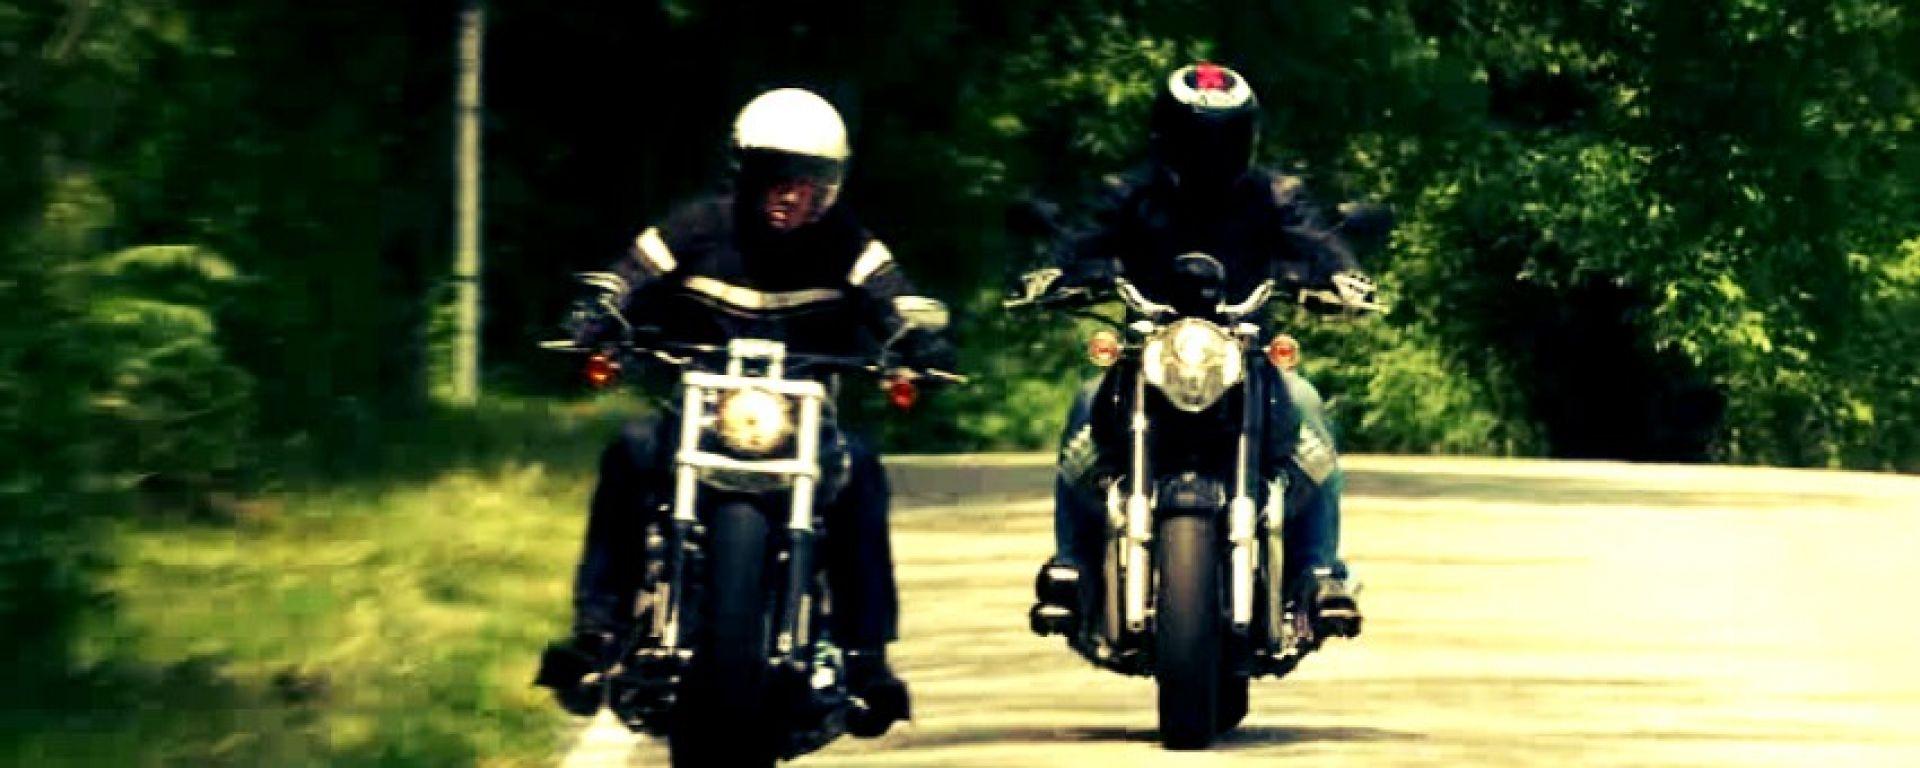 Moto Guzzi California Custom vs HD Softail Breakout